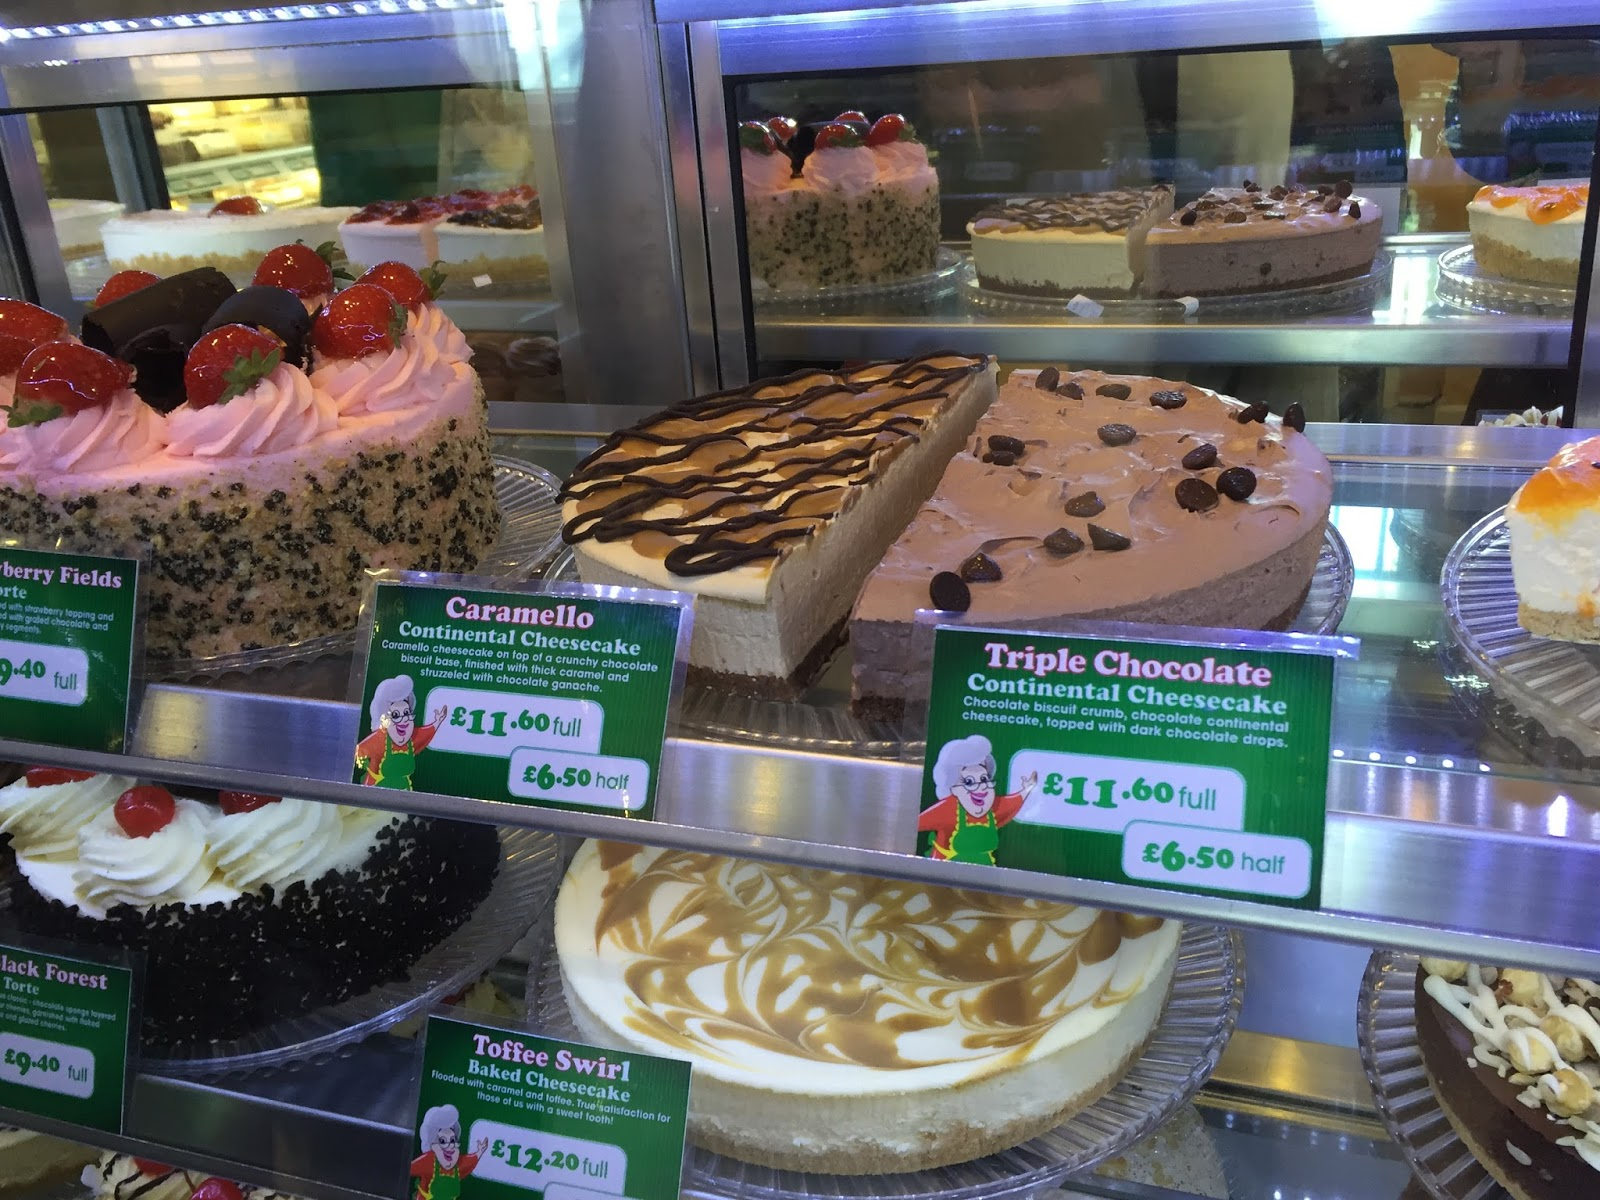 The Cheesecake Shop Nottingham  ramblings of a devoted tea drinker